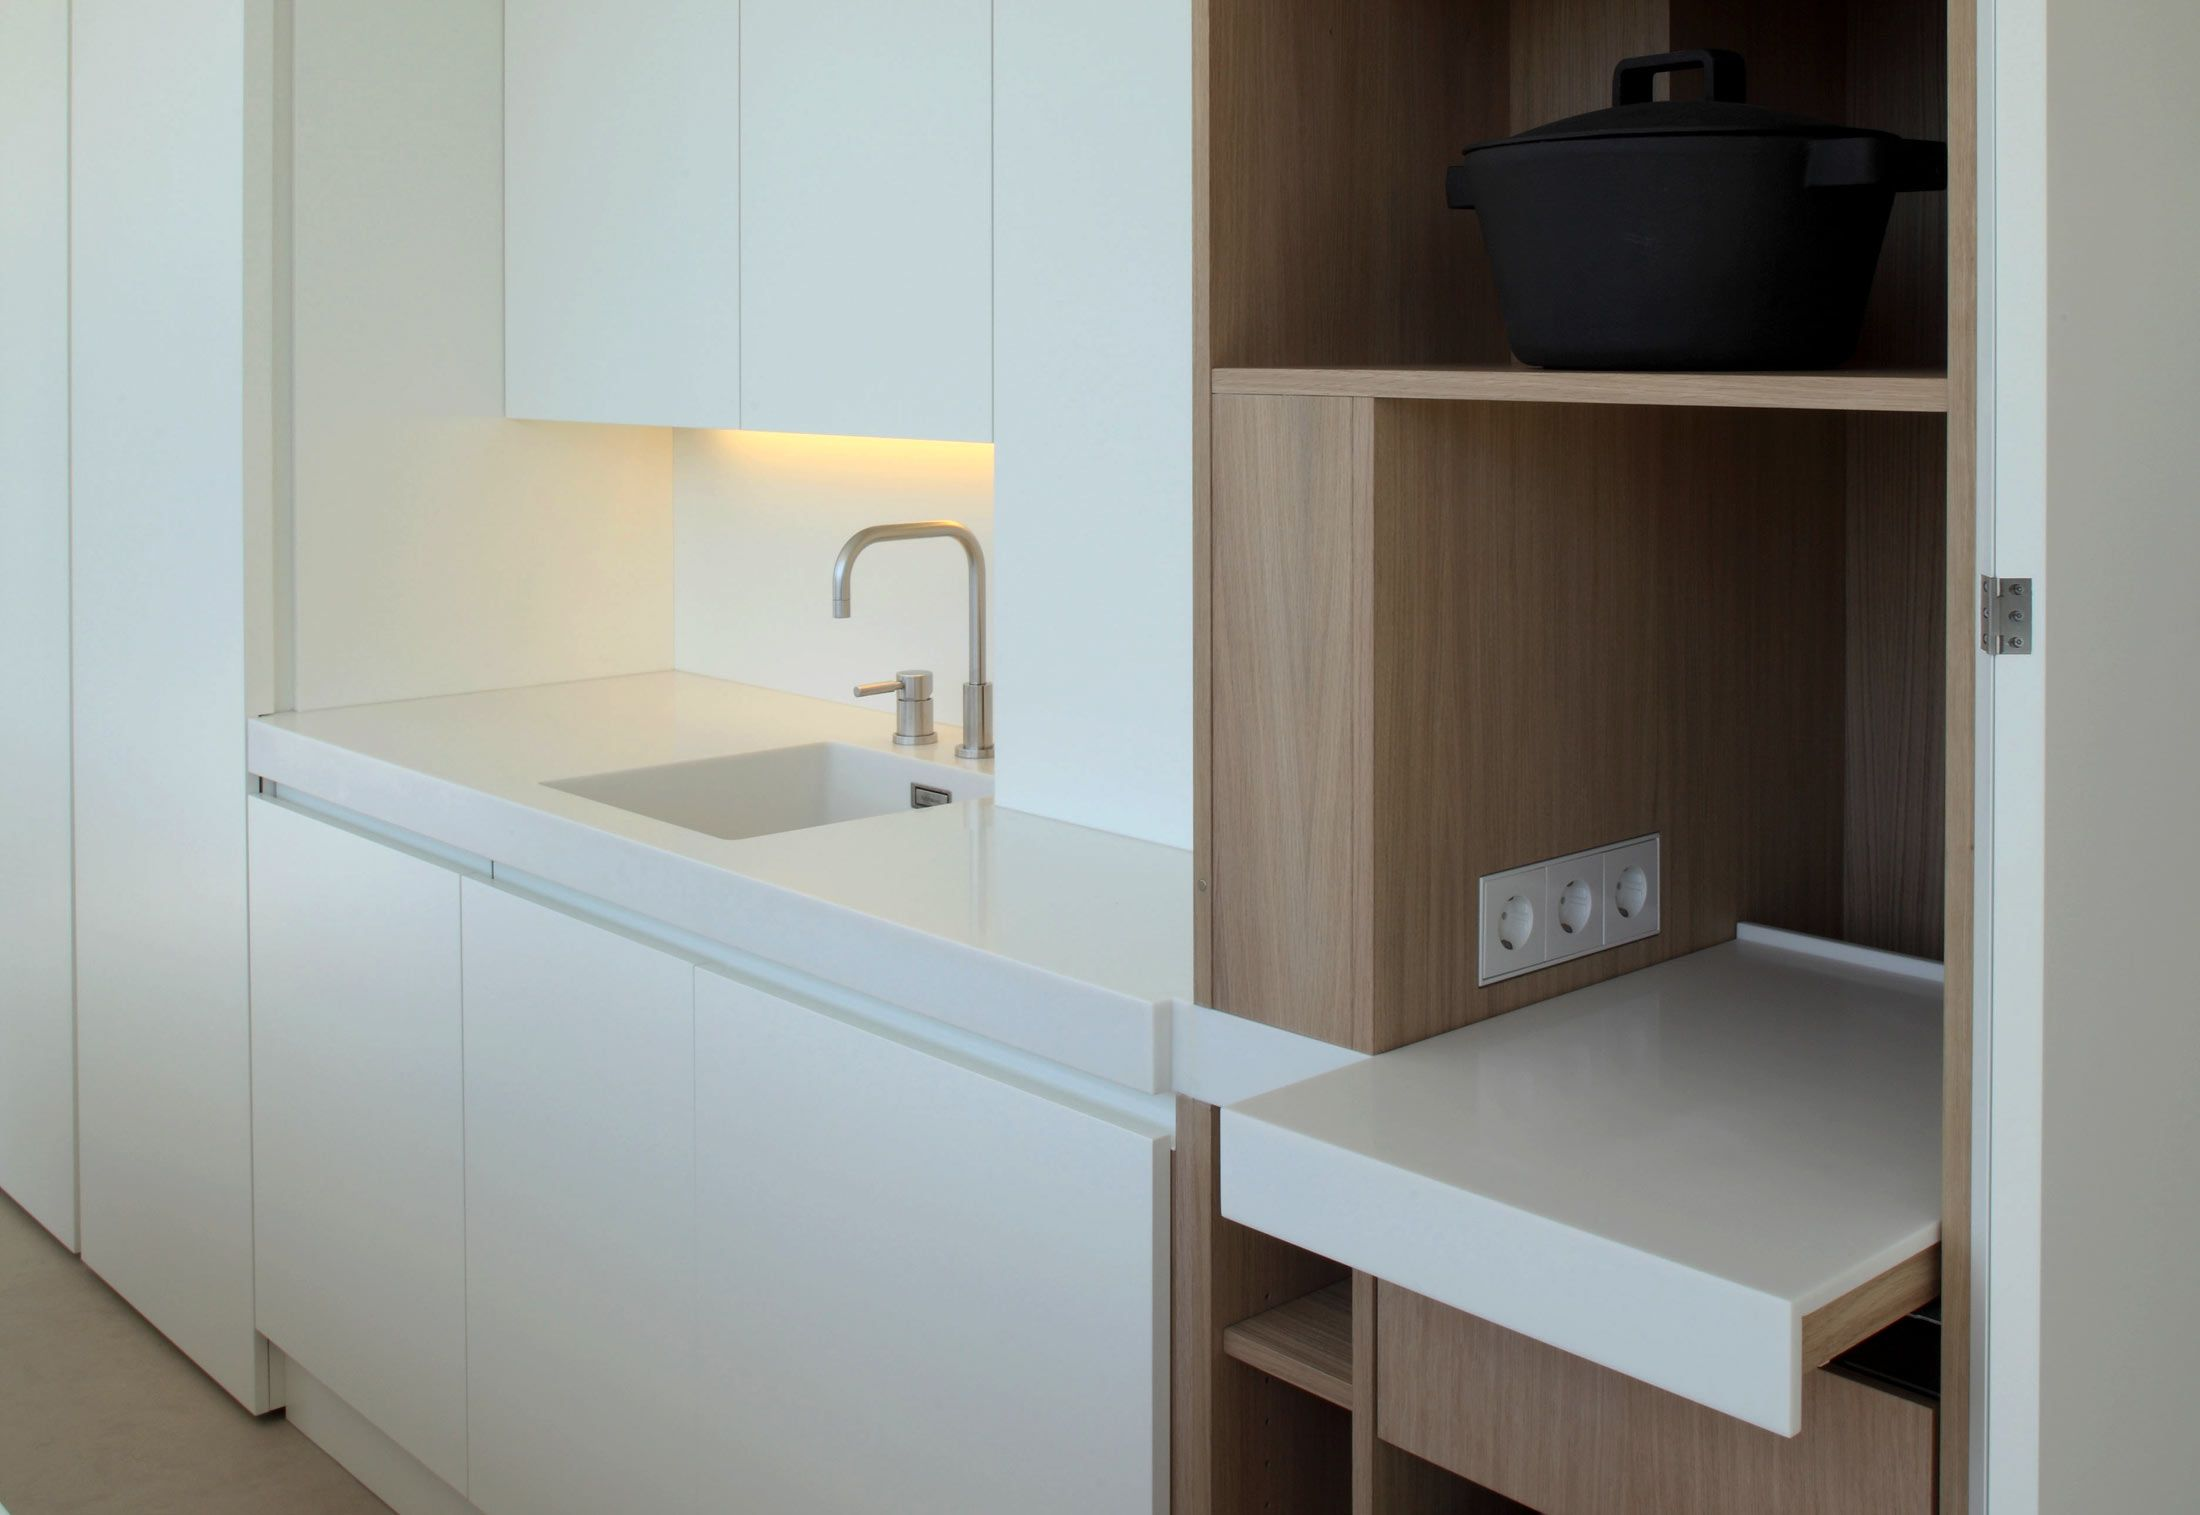 Retractable Shelves Inside This Holzrausch Designed Kitchen Kuhnya Podsobnoe Pomeshenie